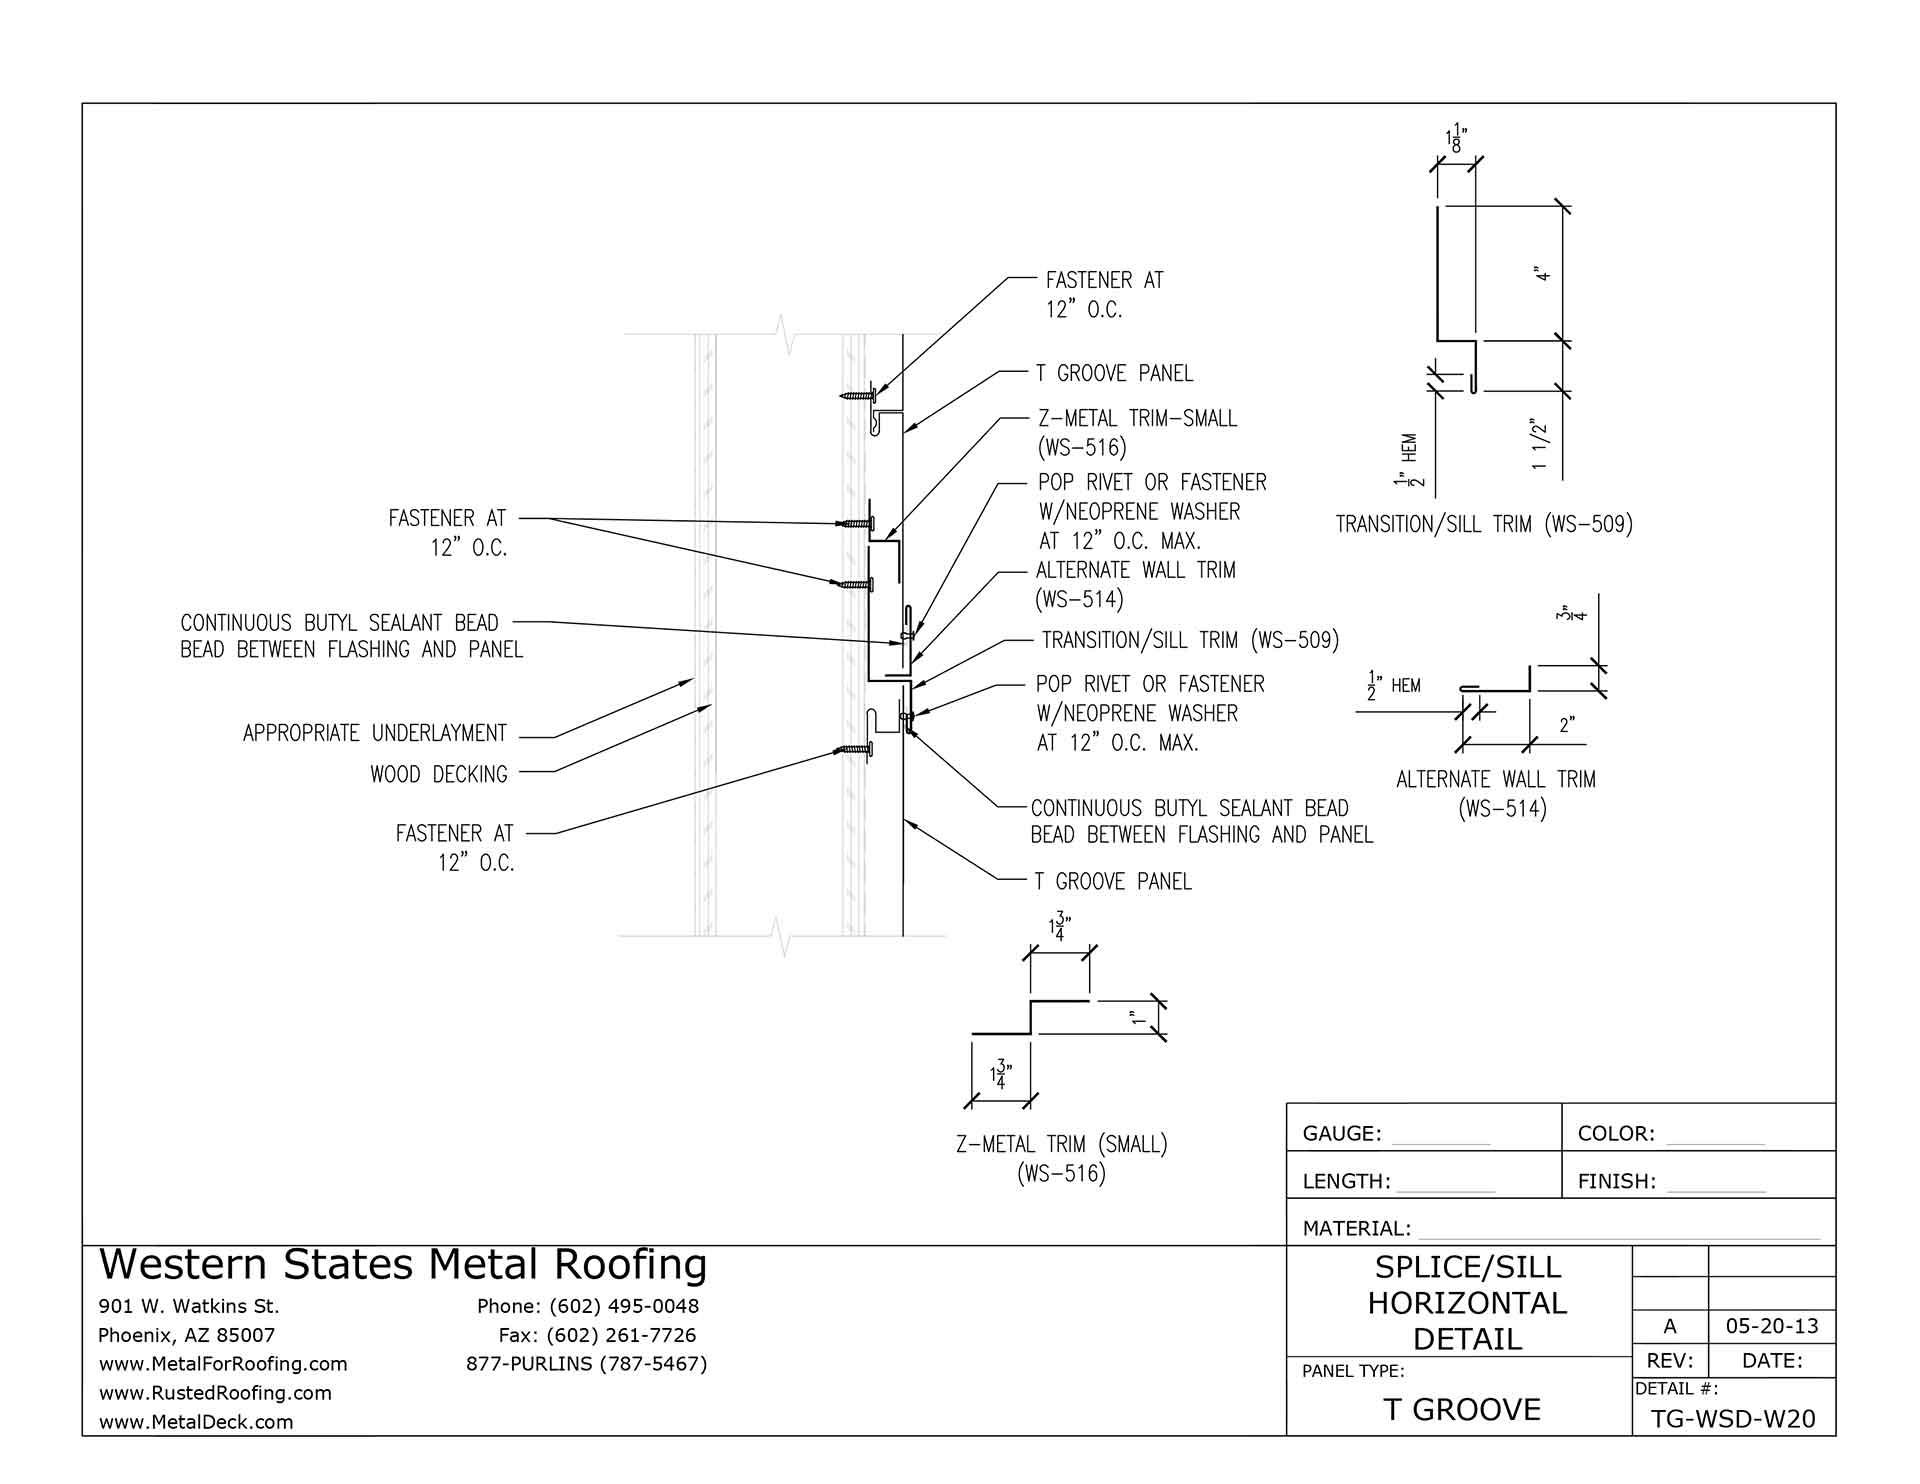 https://f.hubspotusercontent30.net/hubfs/6069238/images/trim-flashings/t-groove/tg-wsd-w20-splice-sill-horizontal-detail.jpg